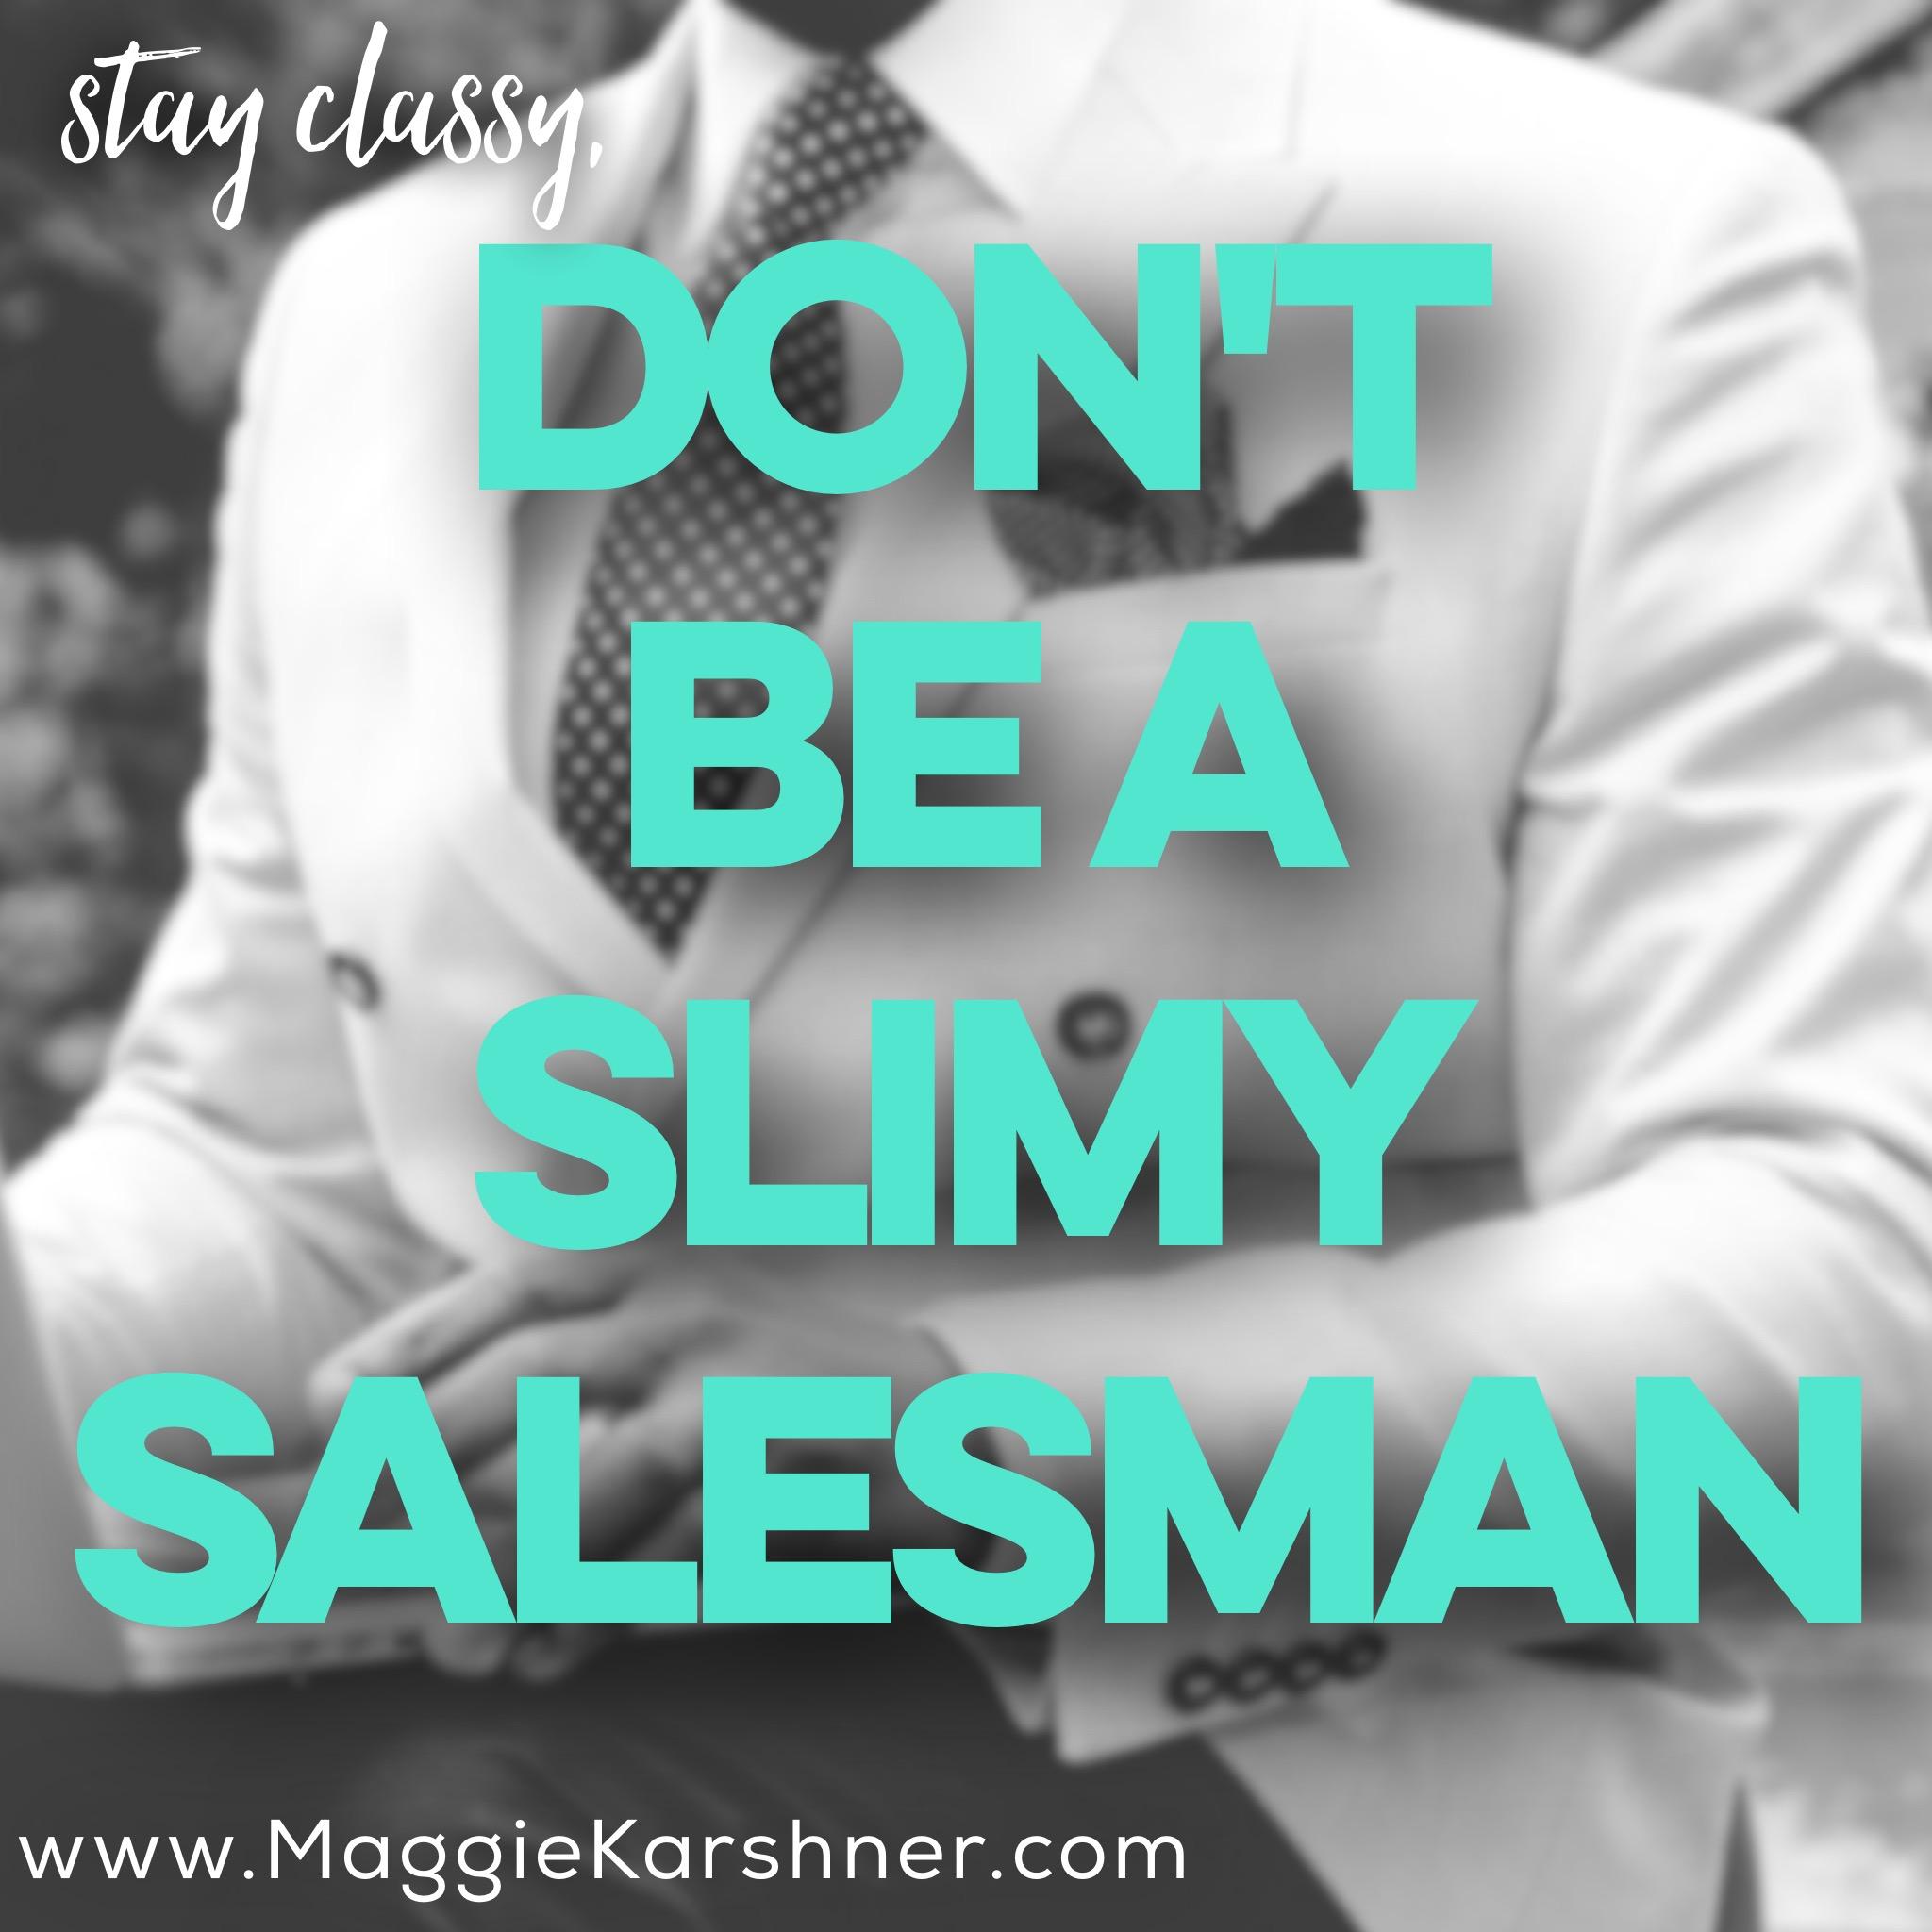 Dont-be-a-slimy-salesman-utilize-modern-sales-tactics.jpg